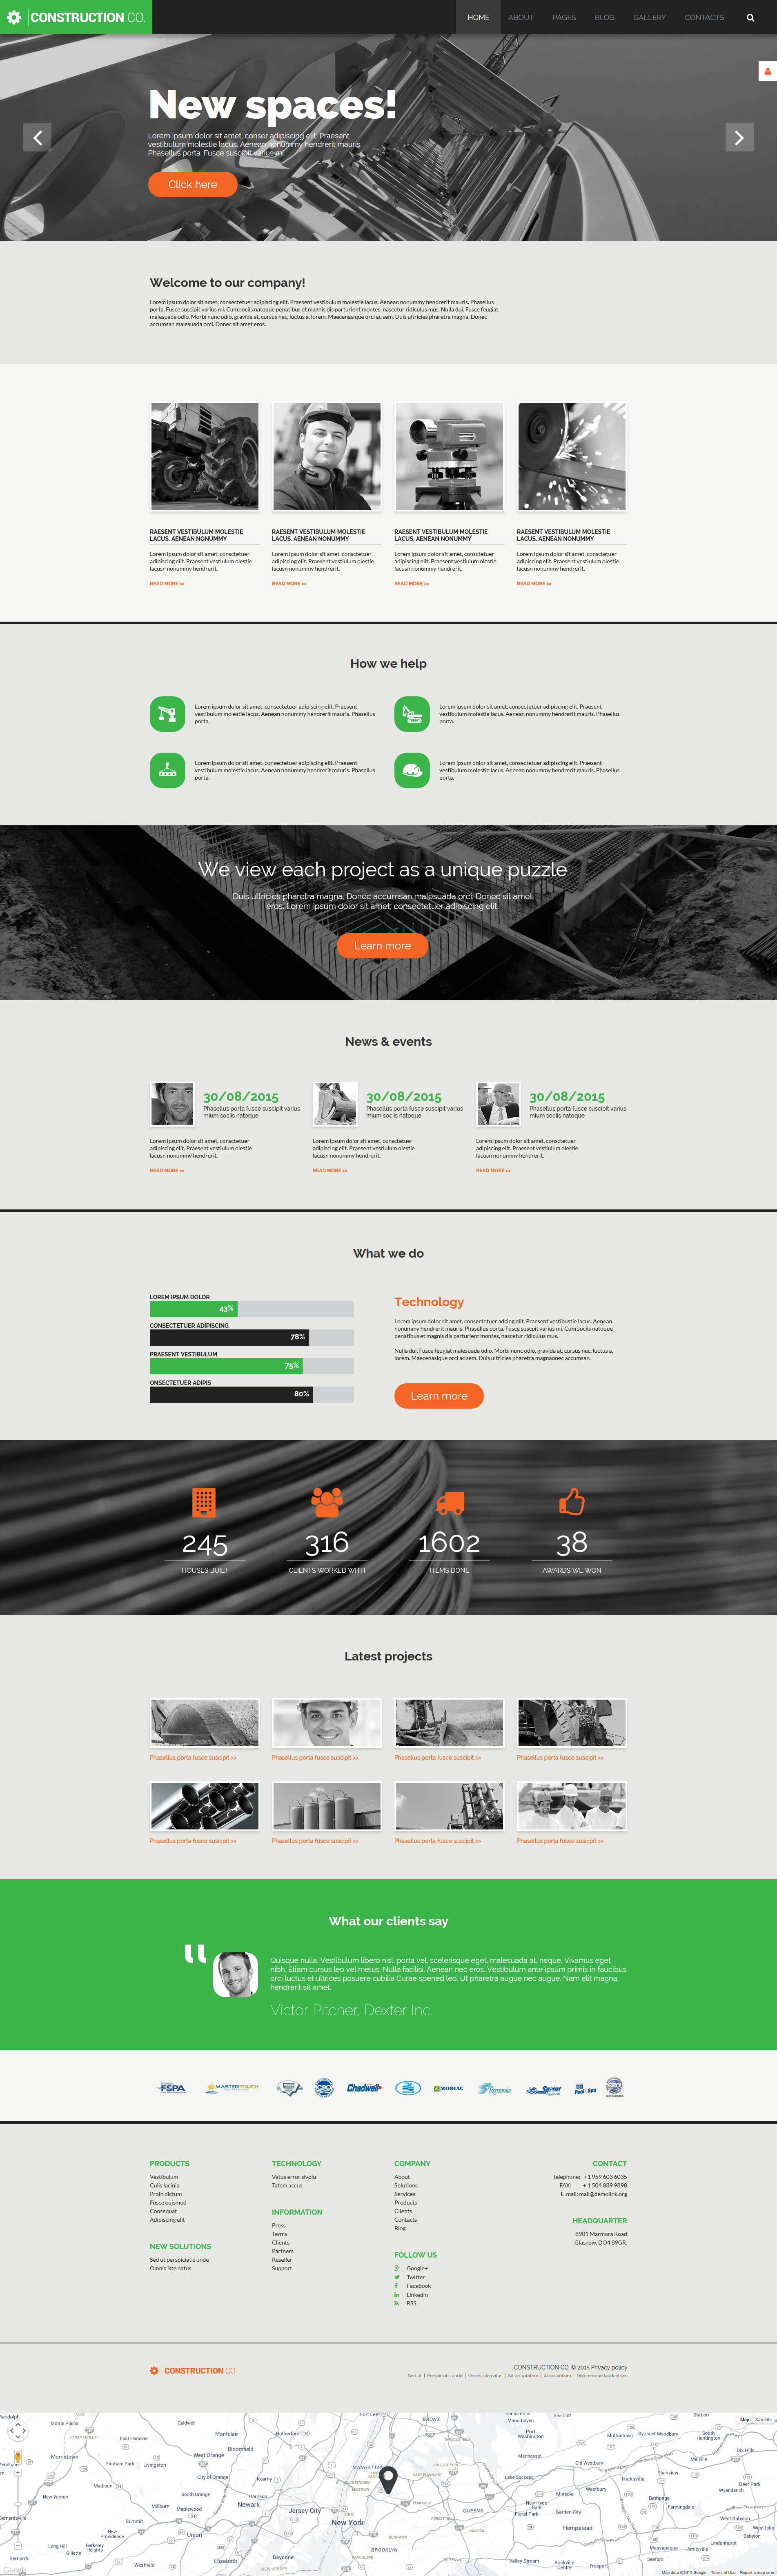 Construction Co. - Construction Company Multipage Corporative Joomla Template